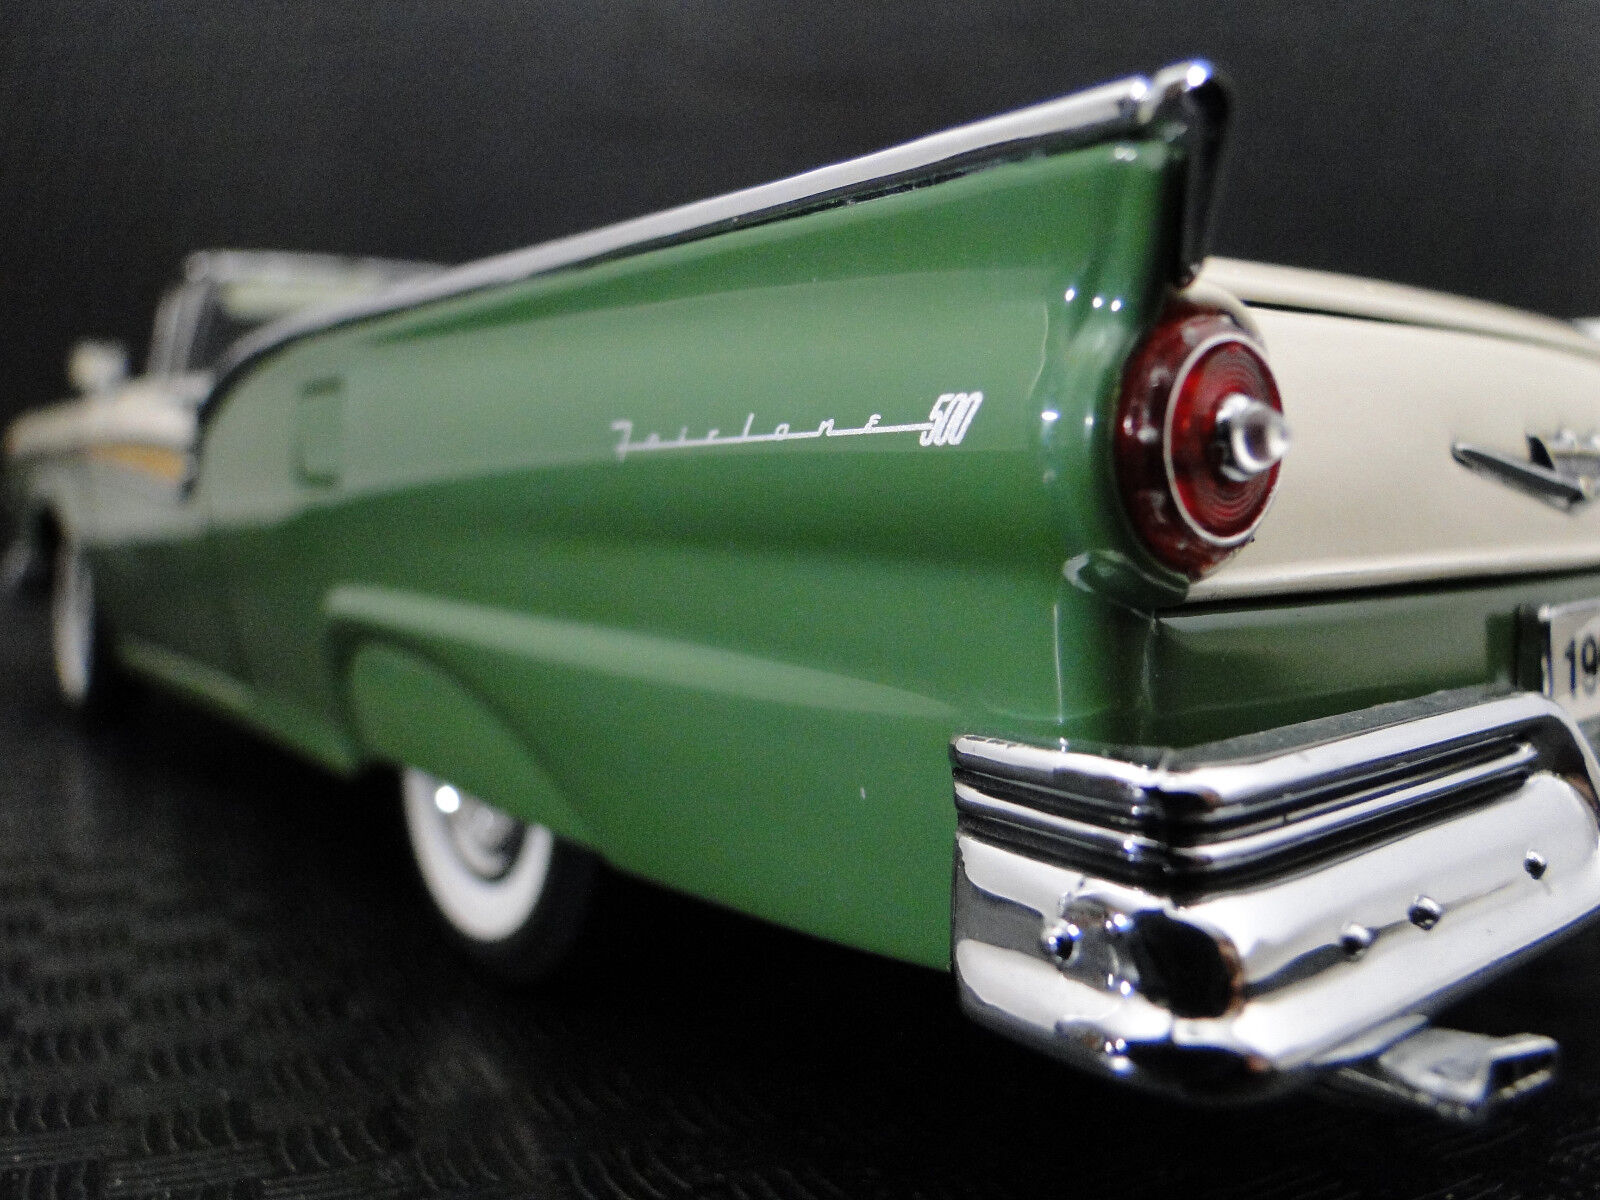 1 Ford construyó 1950s Sport Car 24 Vintage 18 clásico concepto 43 carrusel verde 12